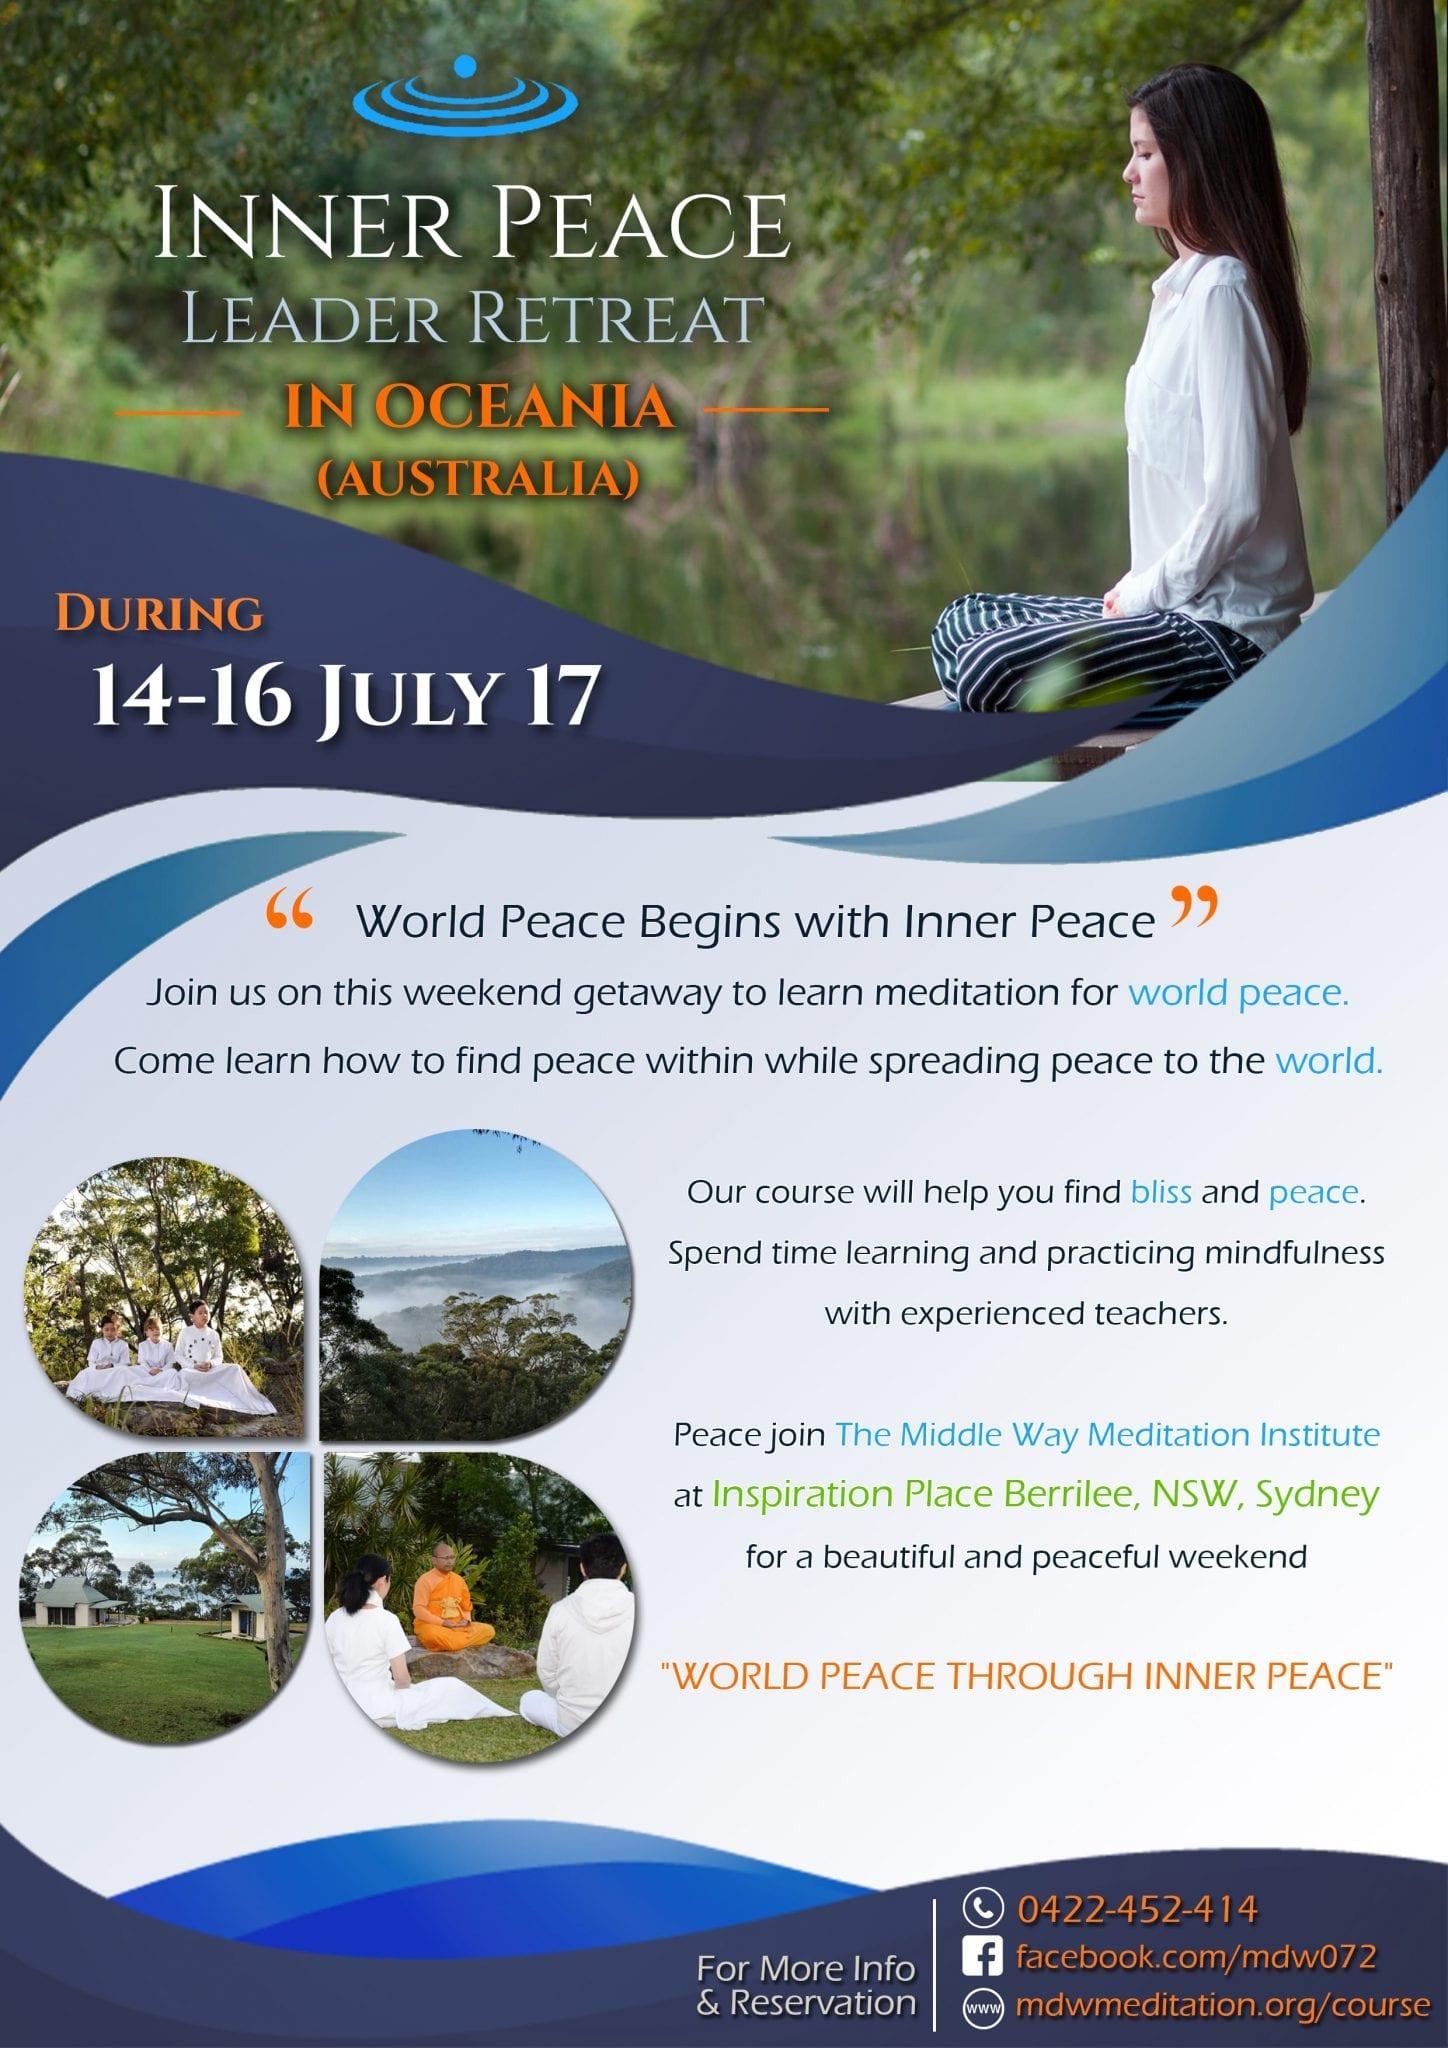 Inner Peace Leader Retreat in Brazil - information